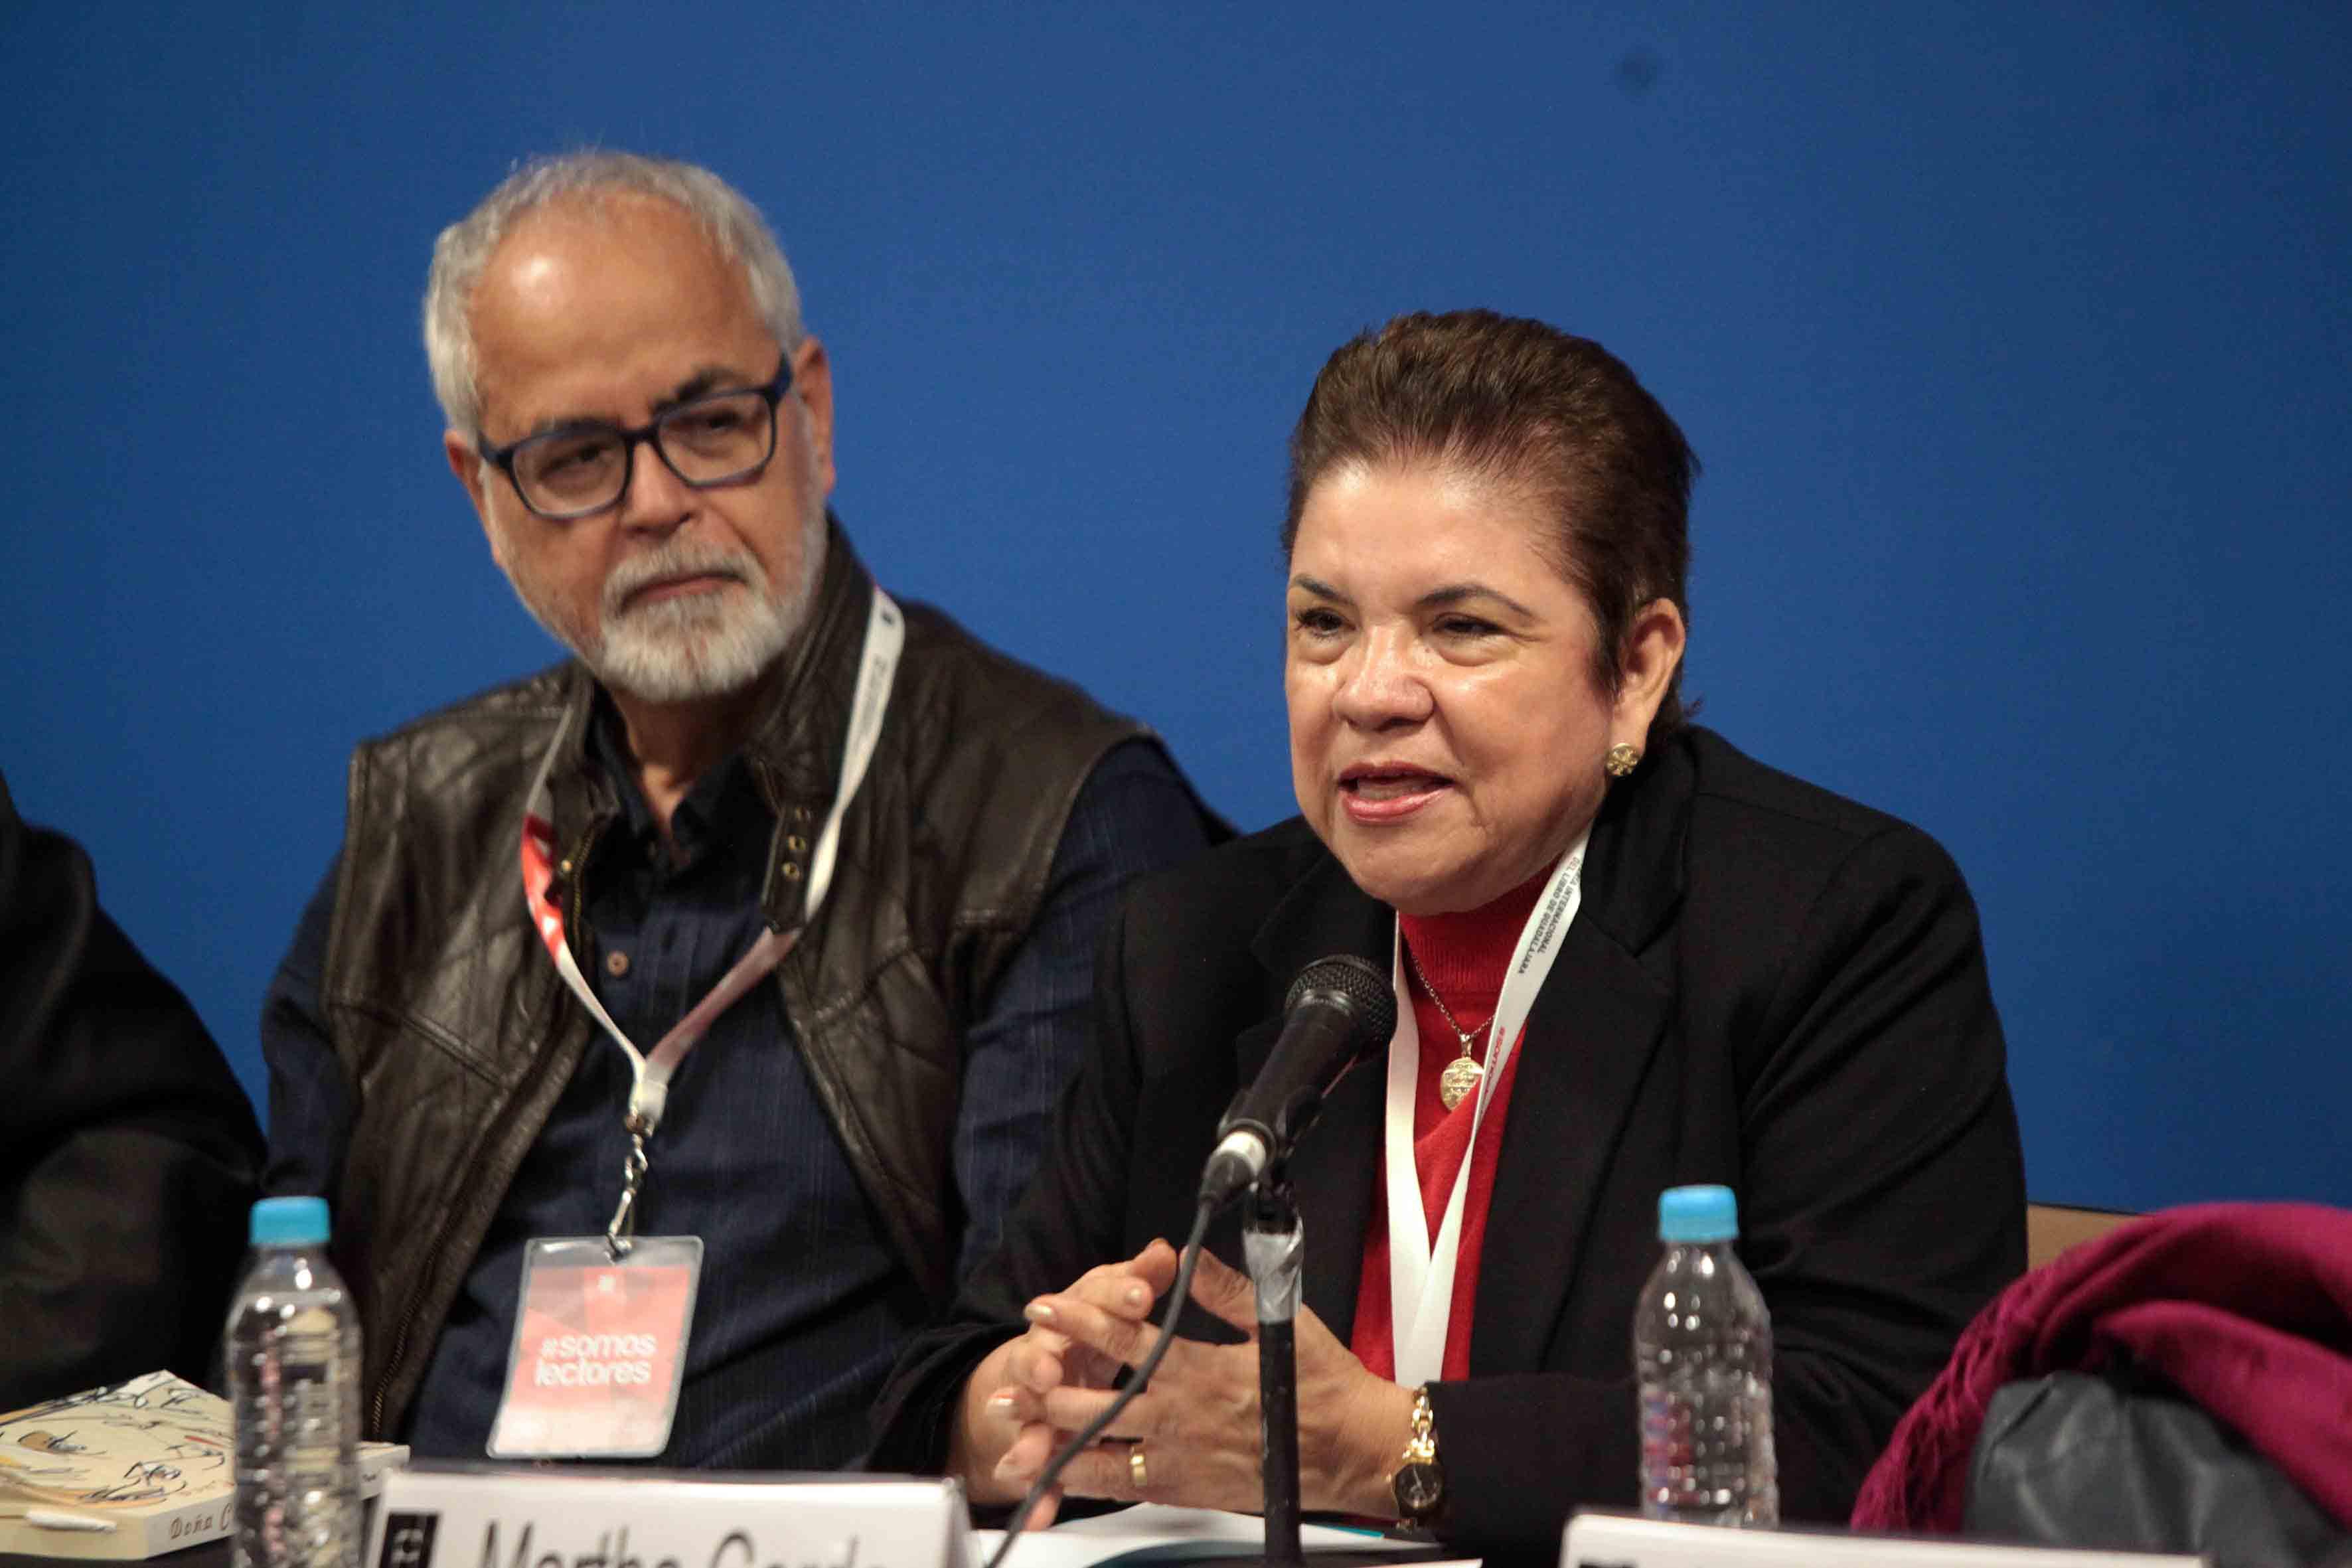 Mtra. Martha Cerda, participando en la presentación de la novela titulada Doña Cuca